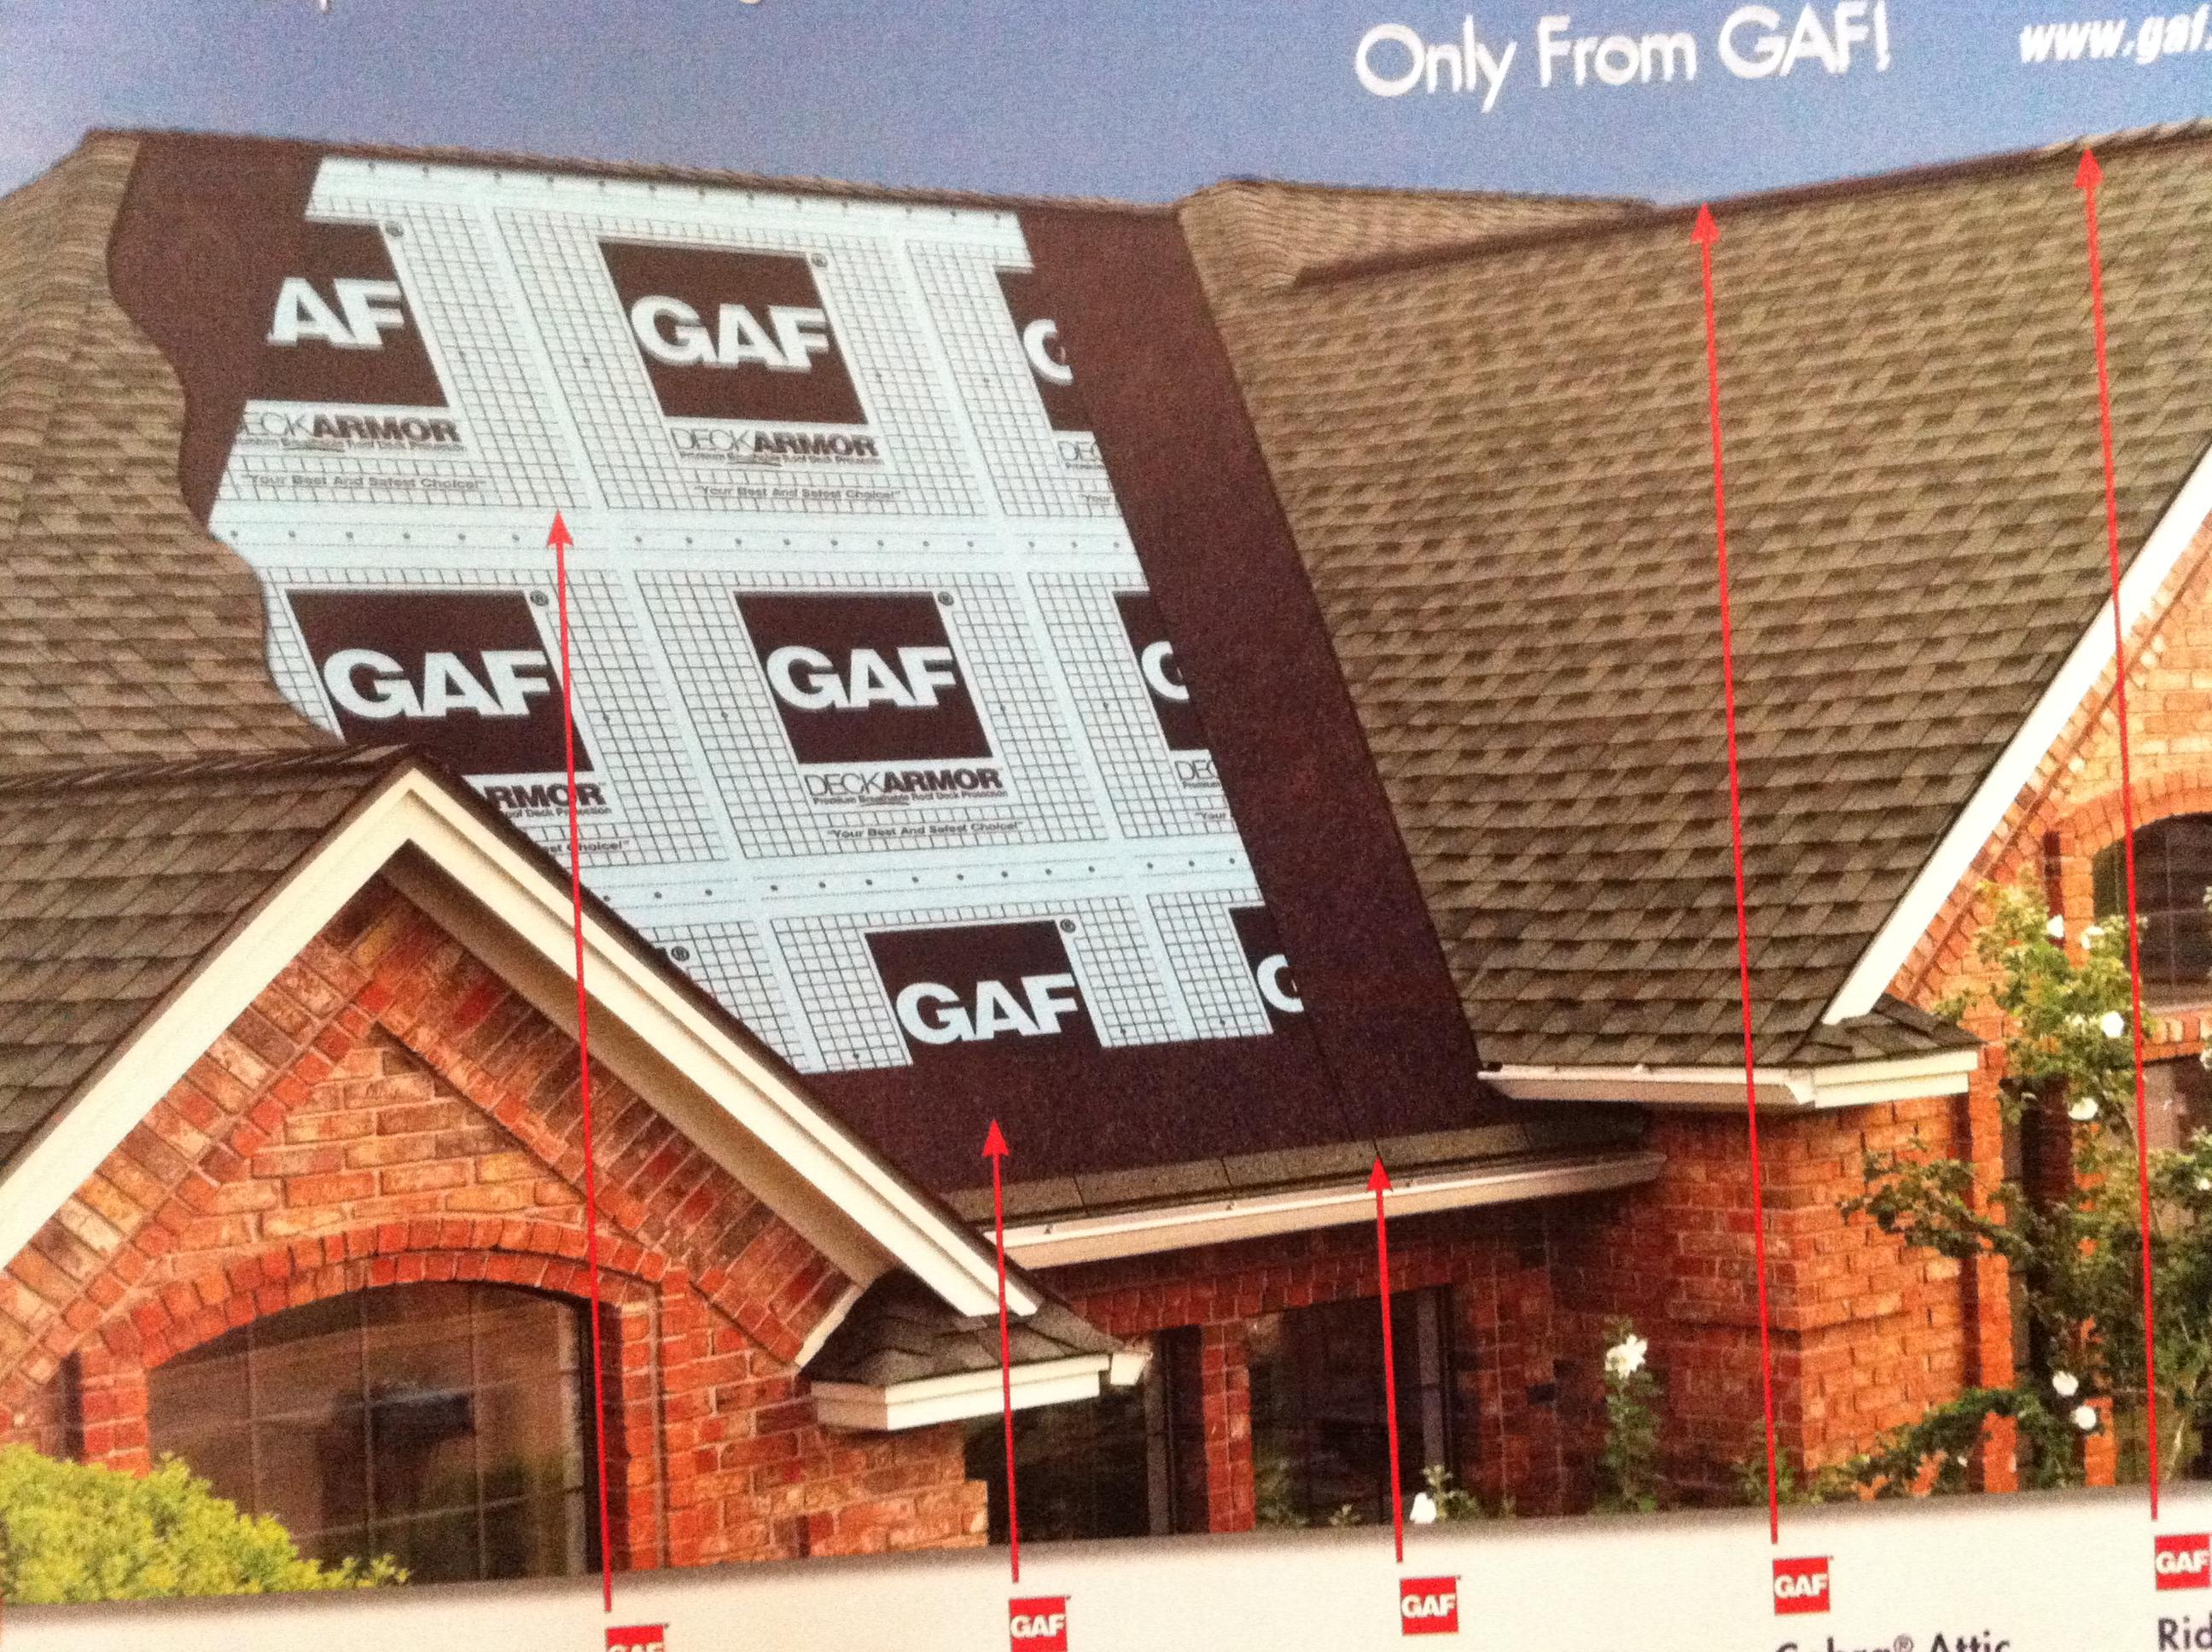 New GAF Roof install